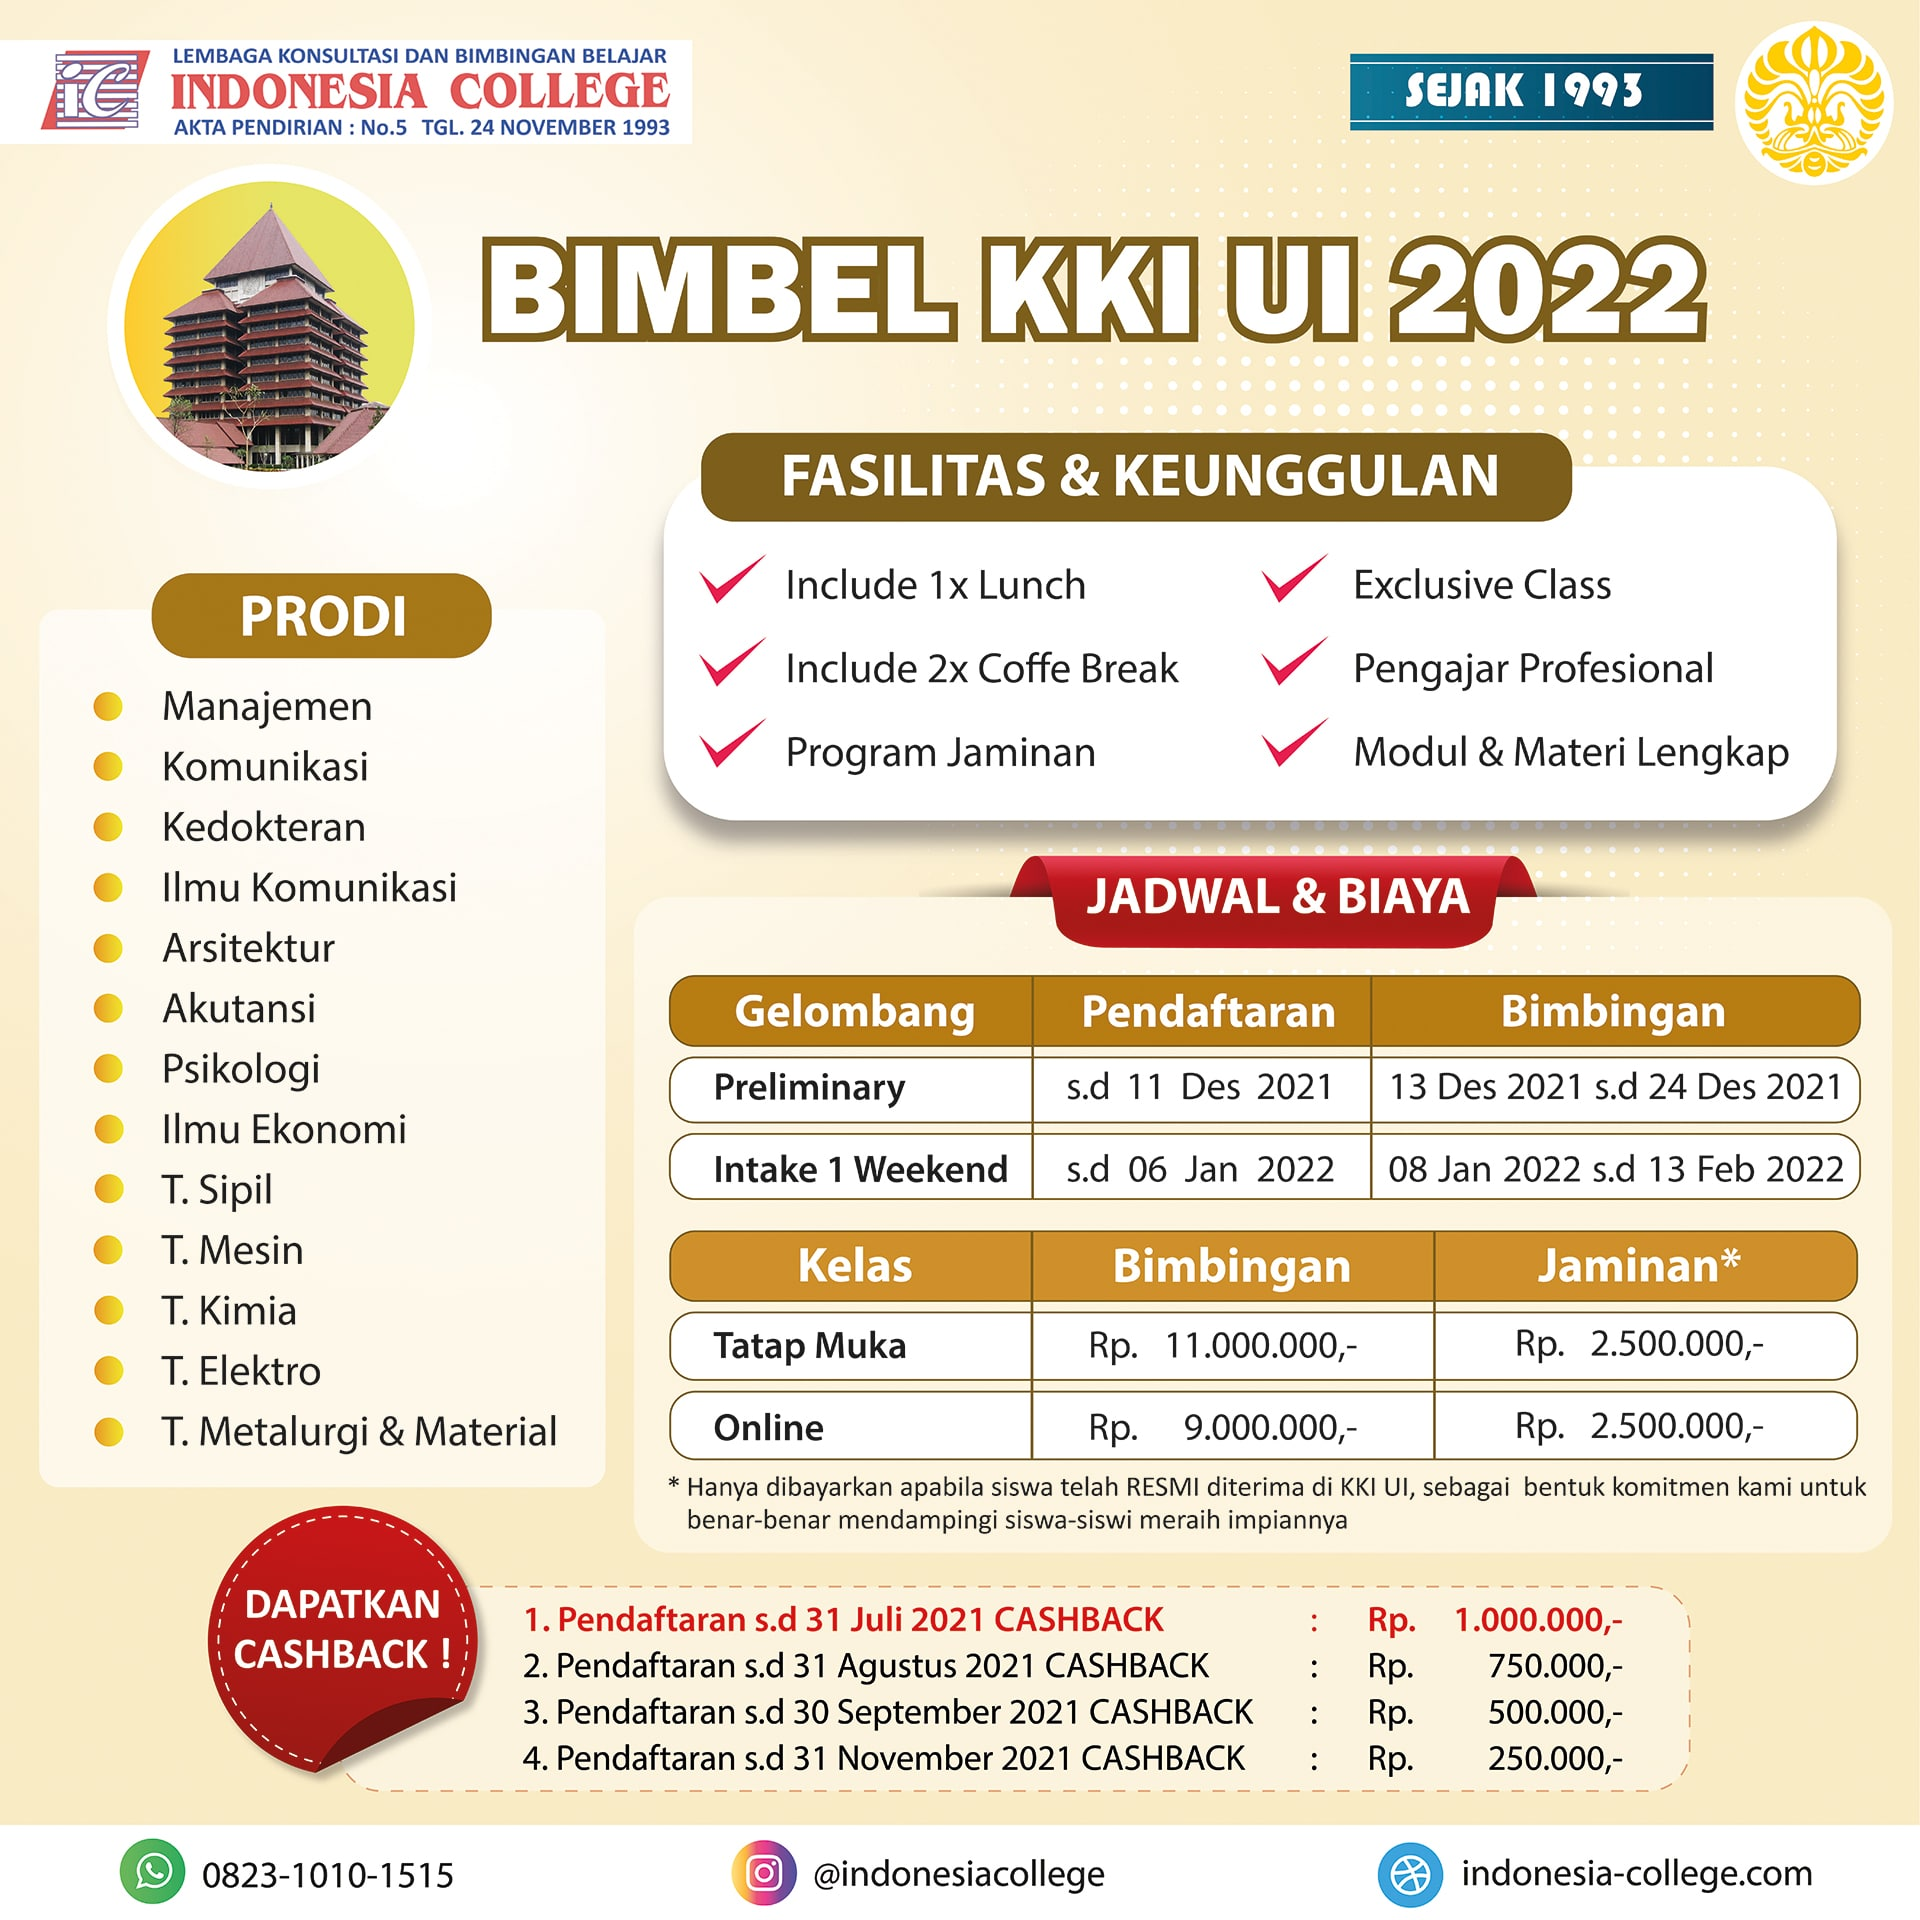 Bimbel KKI UI 2022